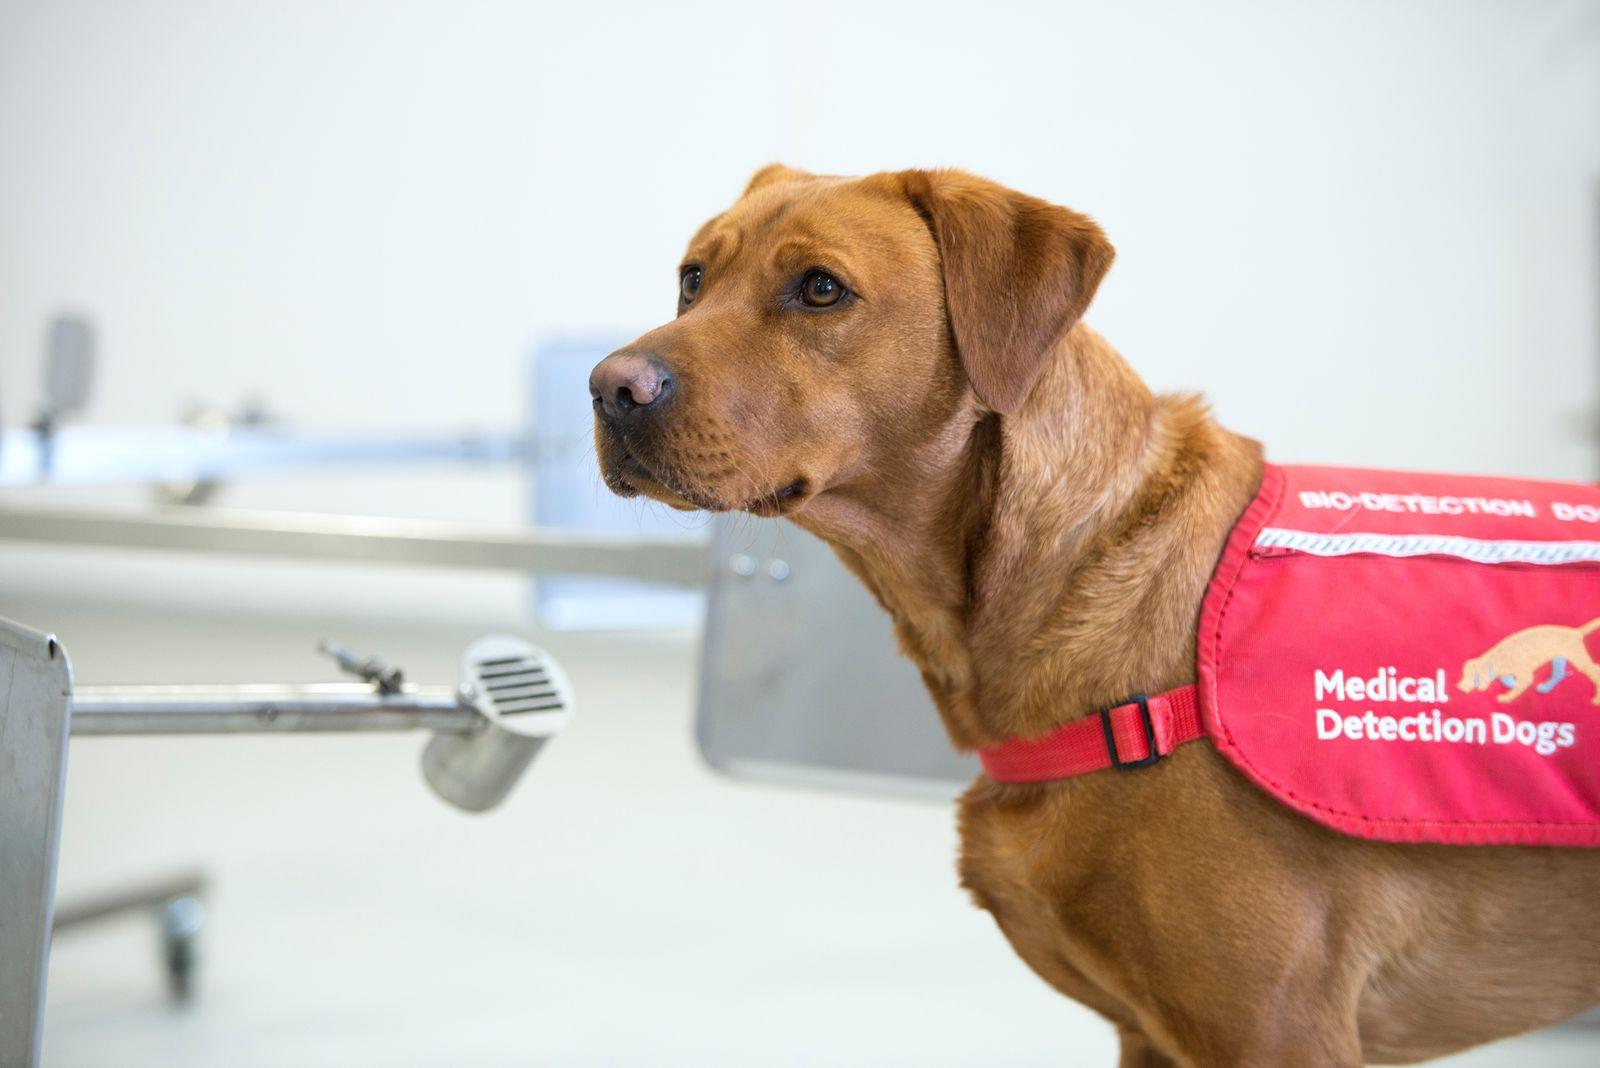 Medical Detection Dogs/ Corona-Hunde